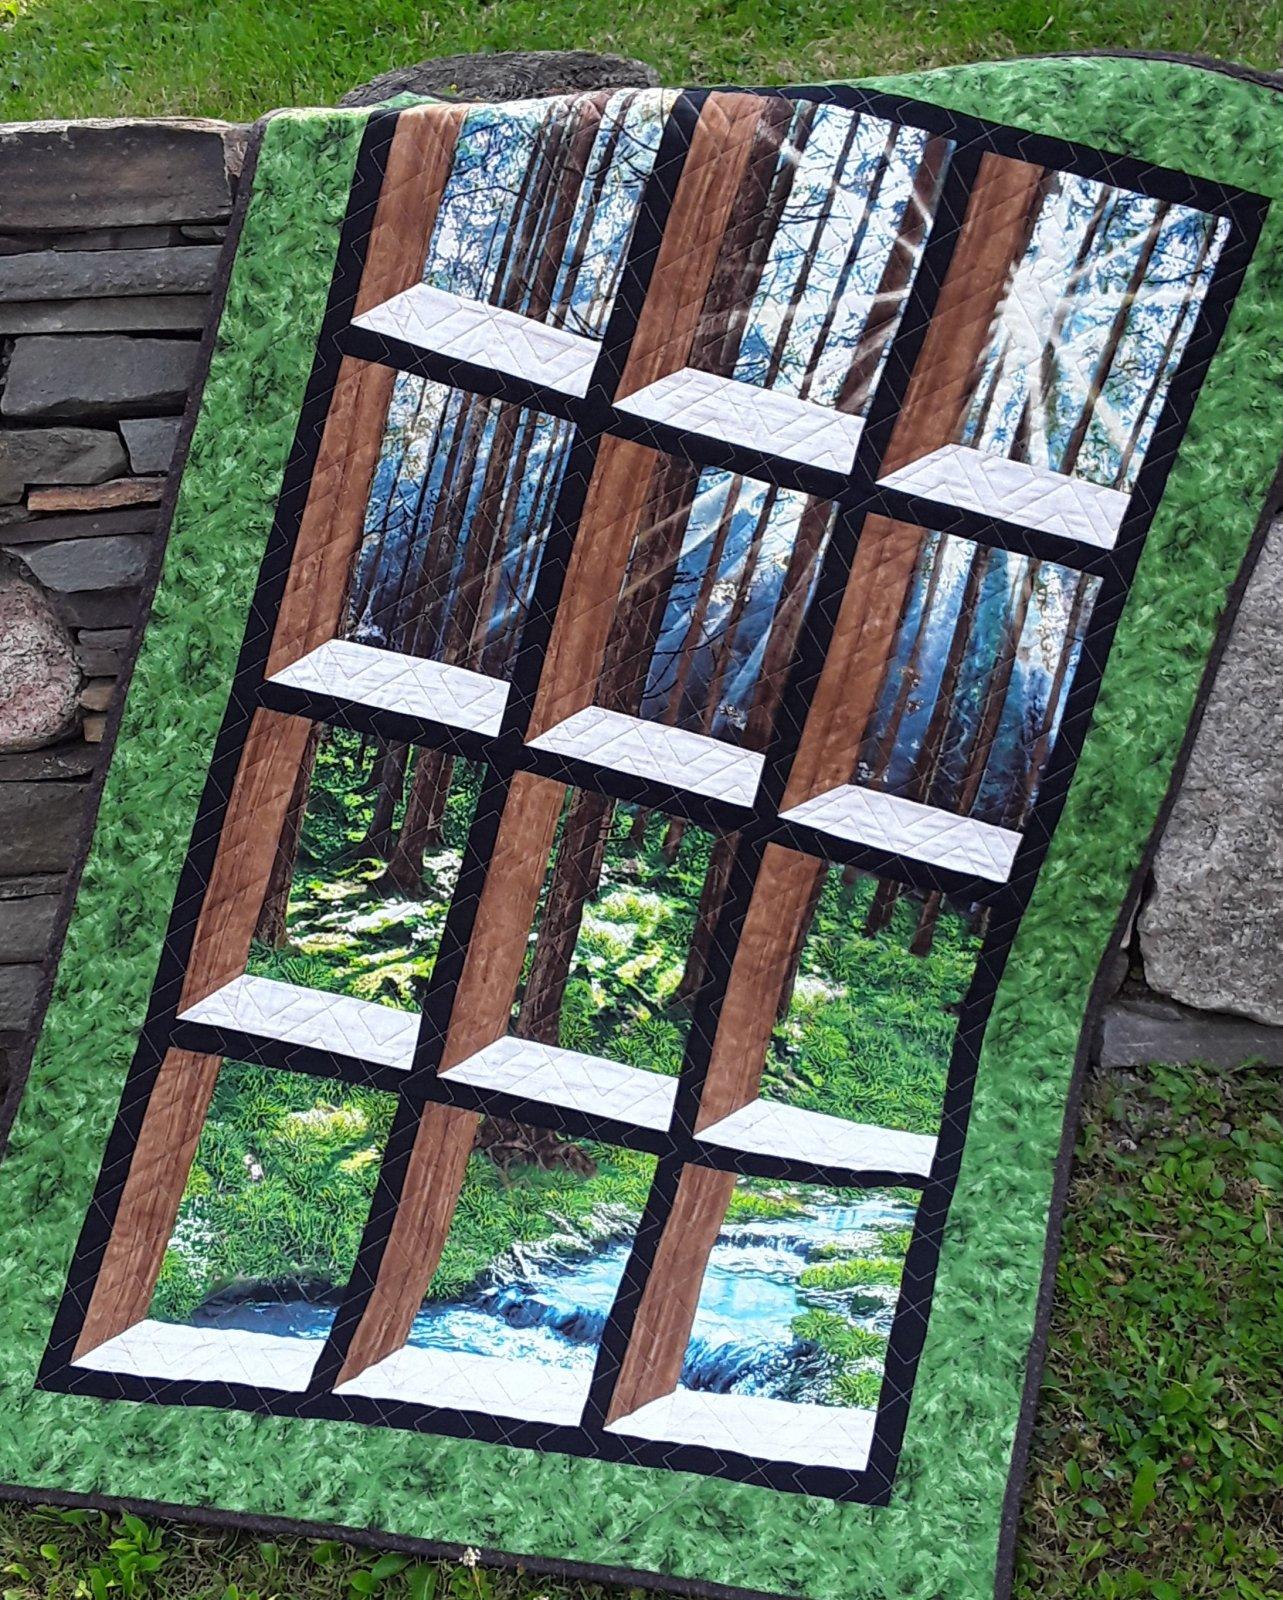 SUNNY FOREST ATTIC WINDOW